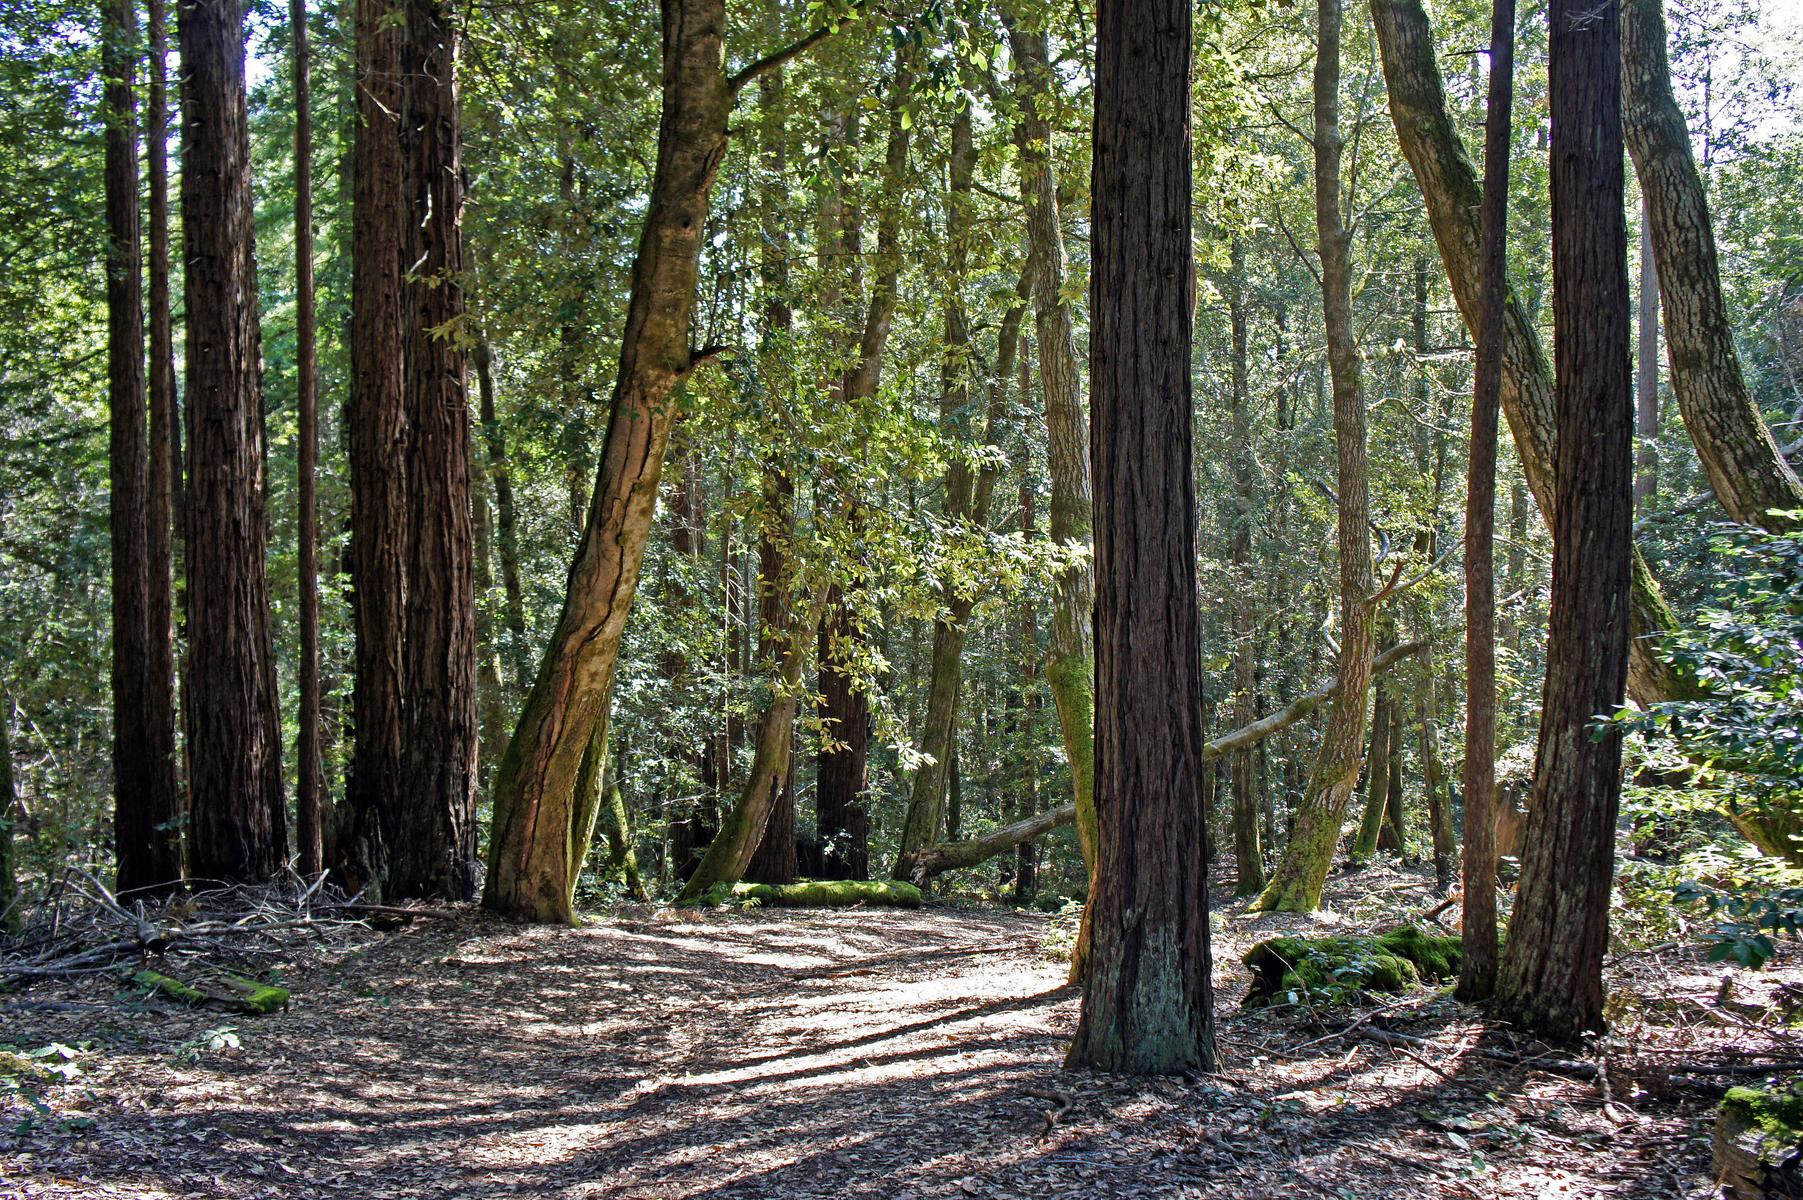 Kruse Rhododendron Reserve, Sonoma County Coast, California